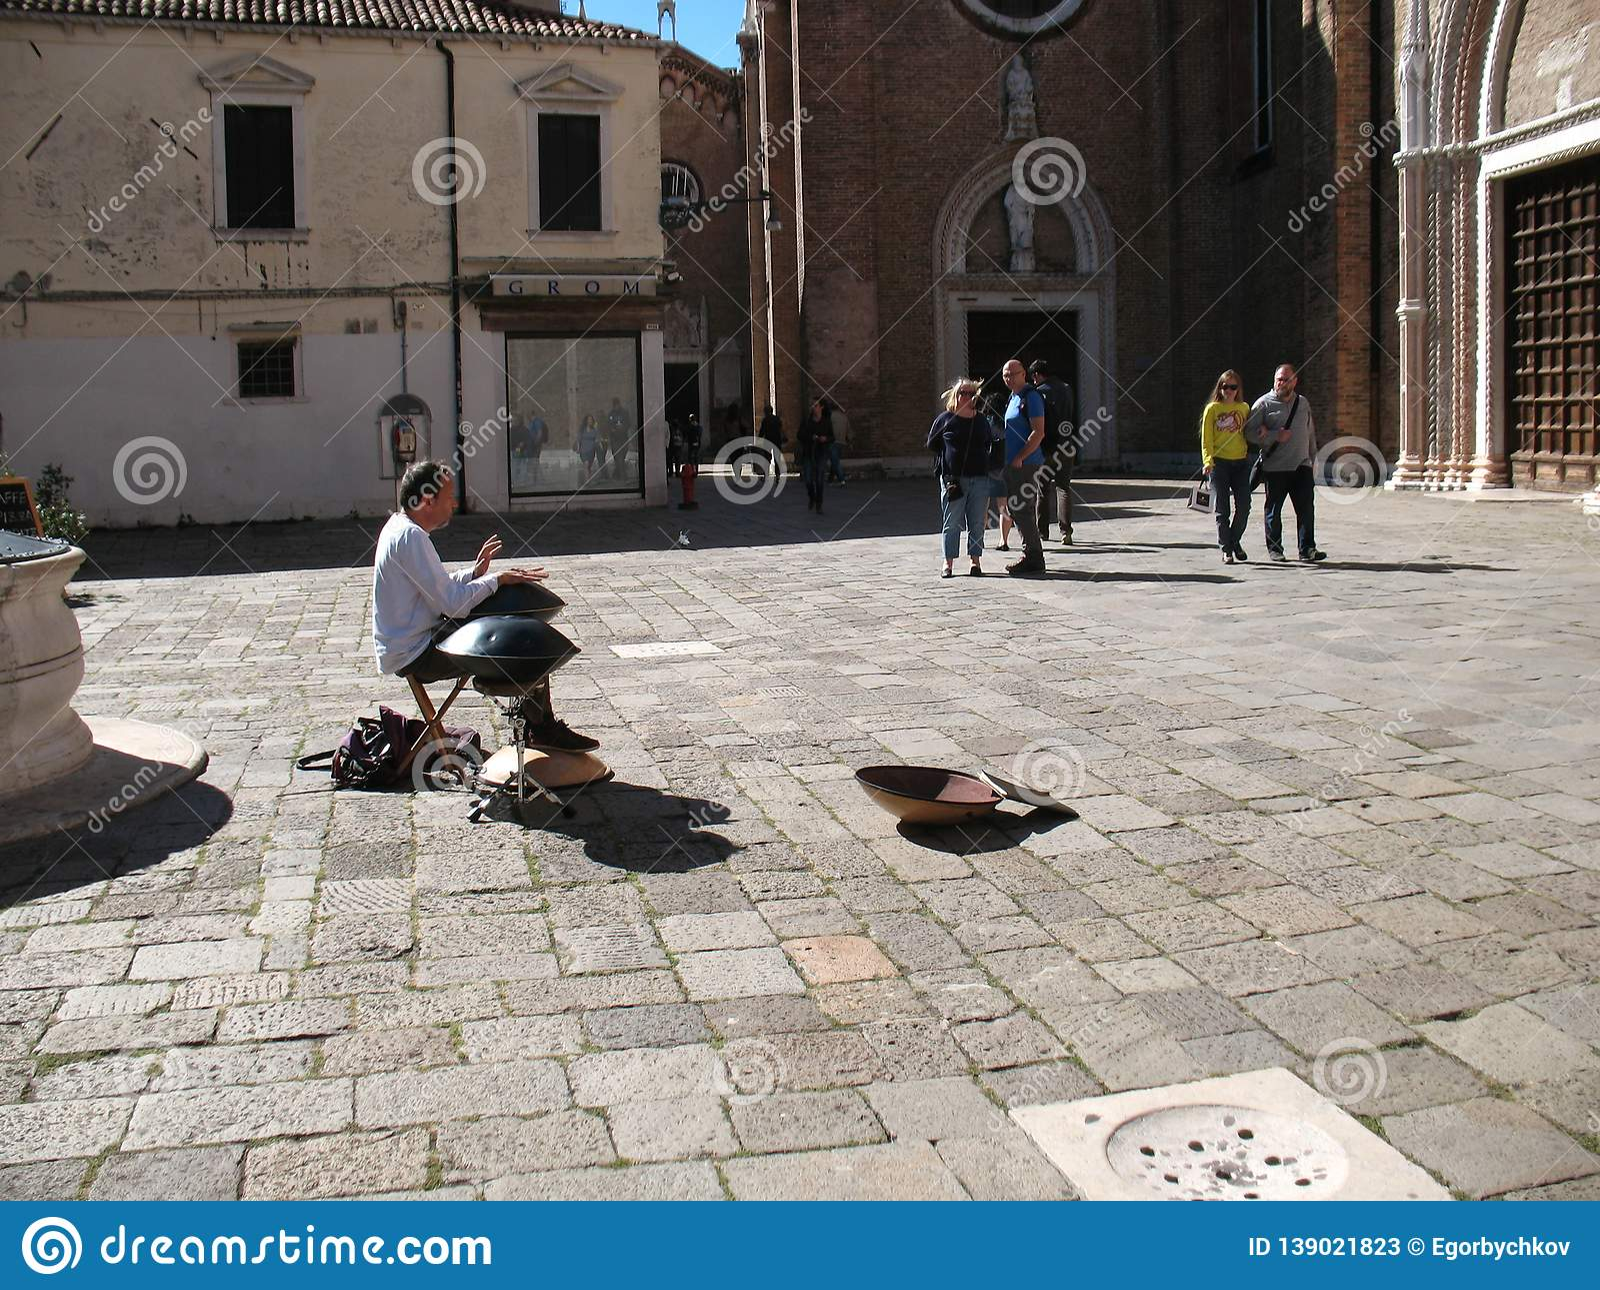 Venezia, Italy - October 04, 2016: Musician entertaining tourists